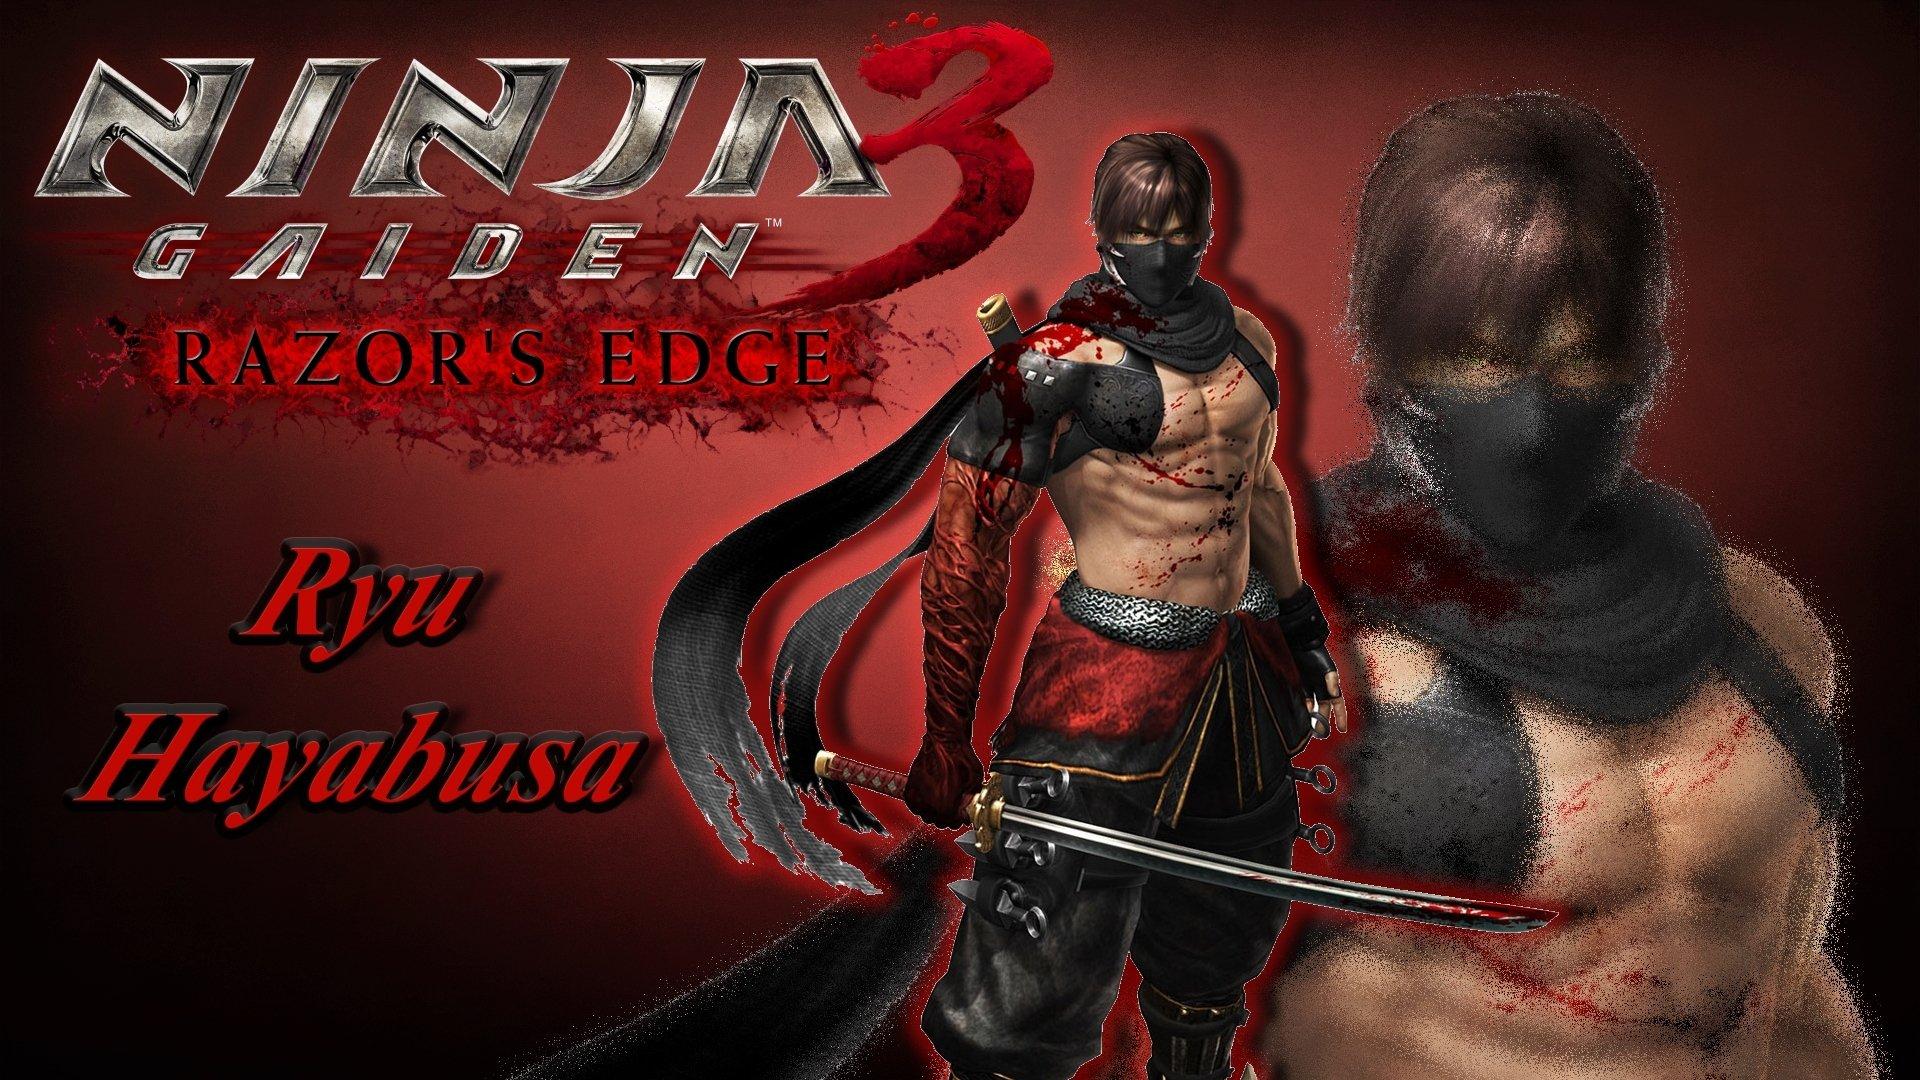 Game Ninja Gaiden Wallpaper: Warrior Ryu Hayabusa HD Wallpaper